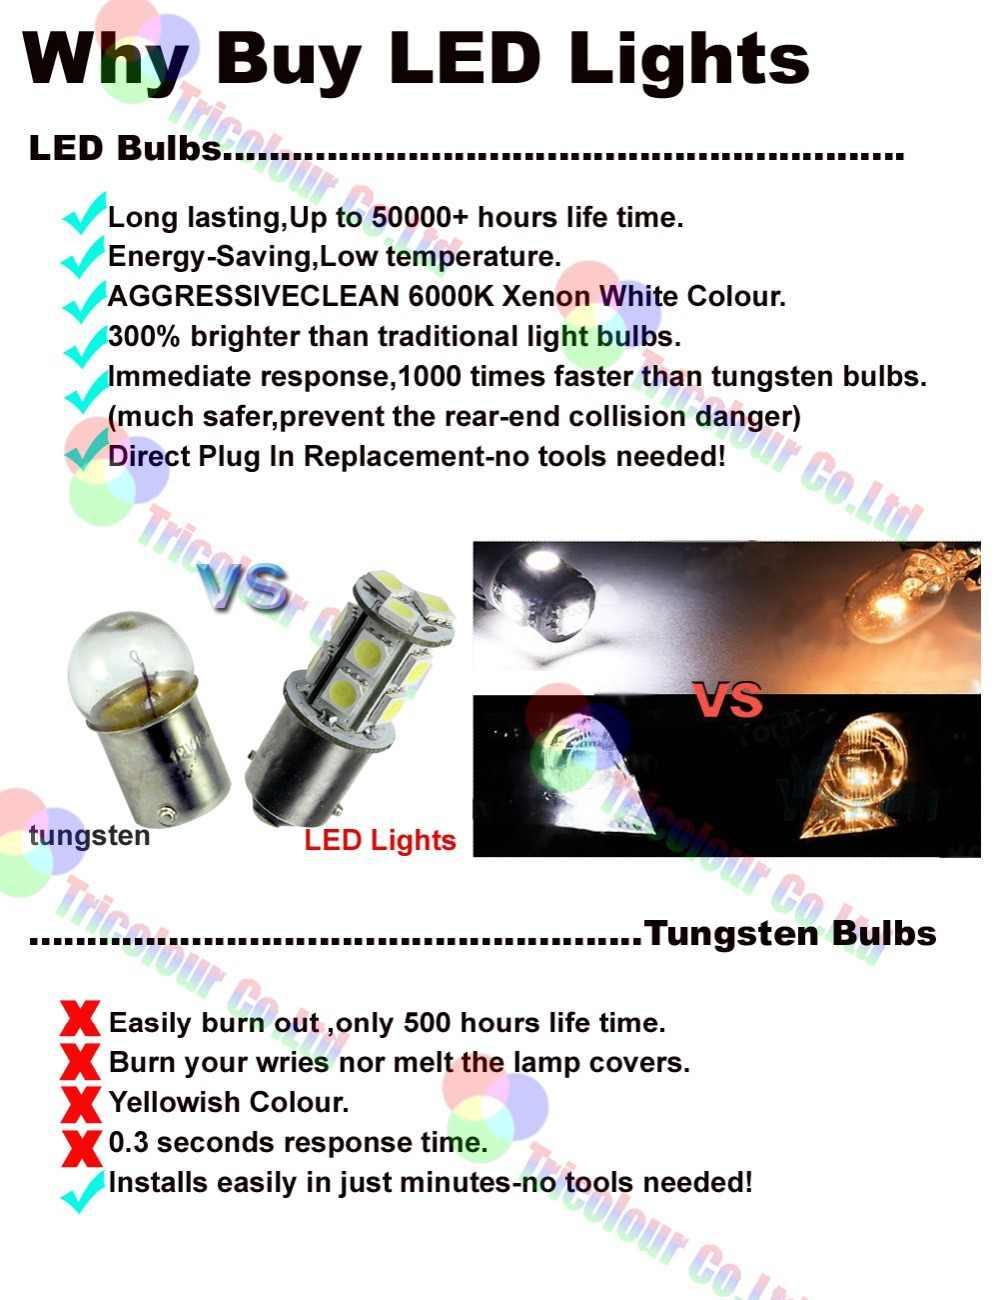 AutoEC 2x High power H11 50w 9005 9006 led 8 smd fog light Car Driving day time running Bulb Lamp lights 12v #LI10